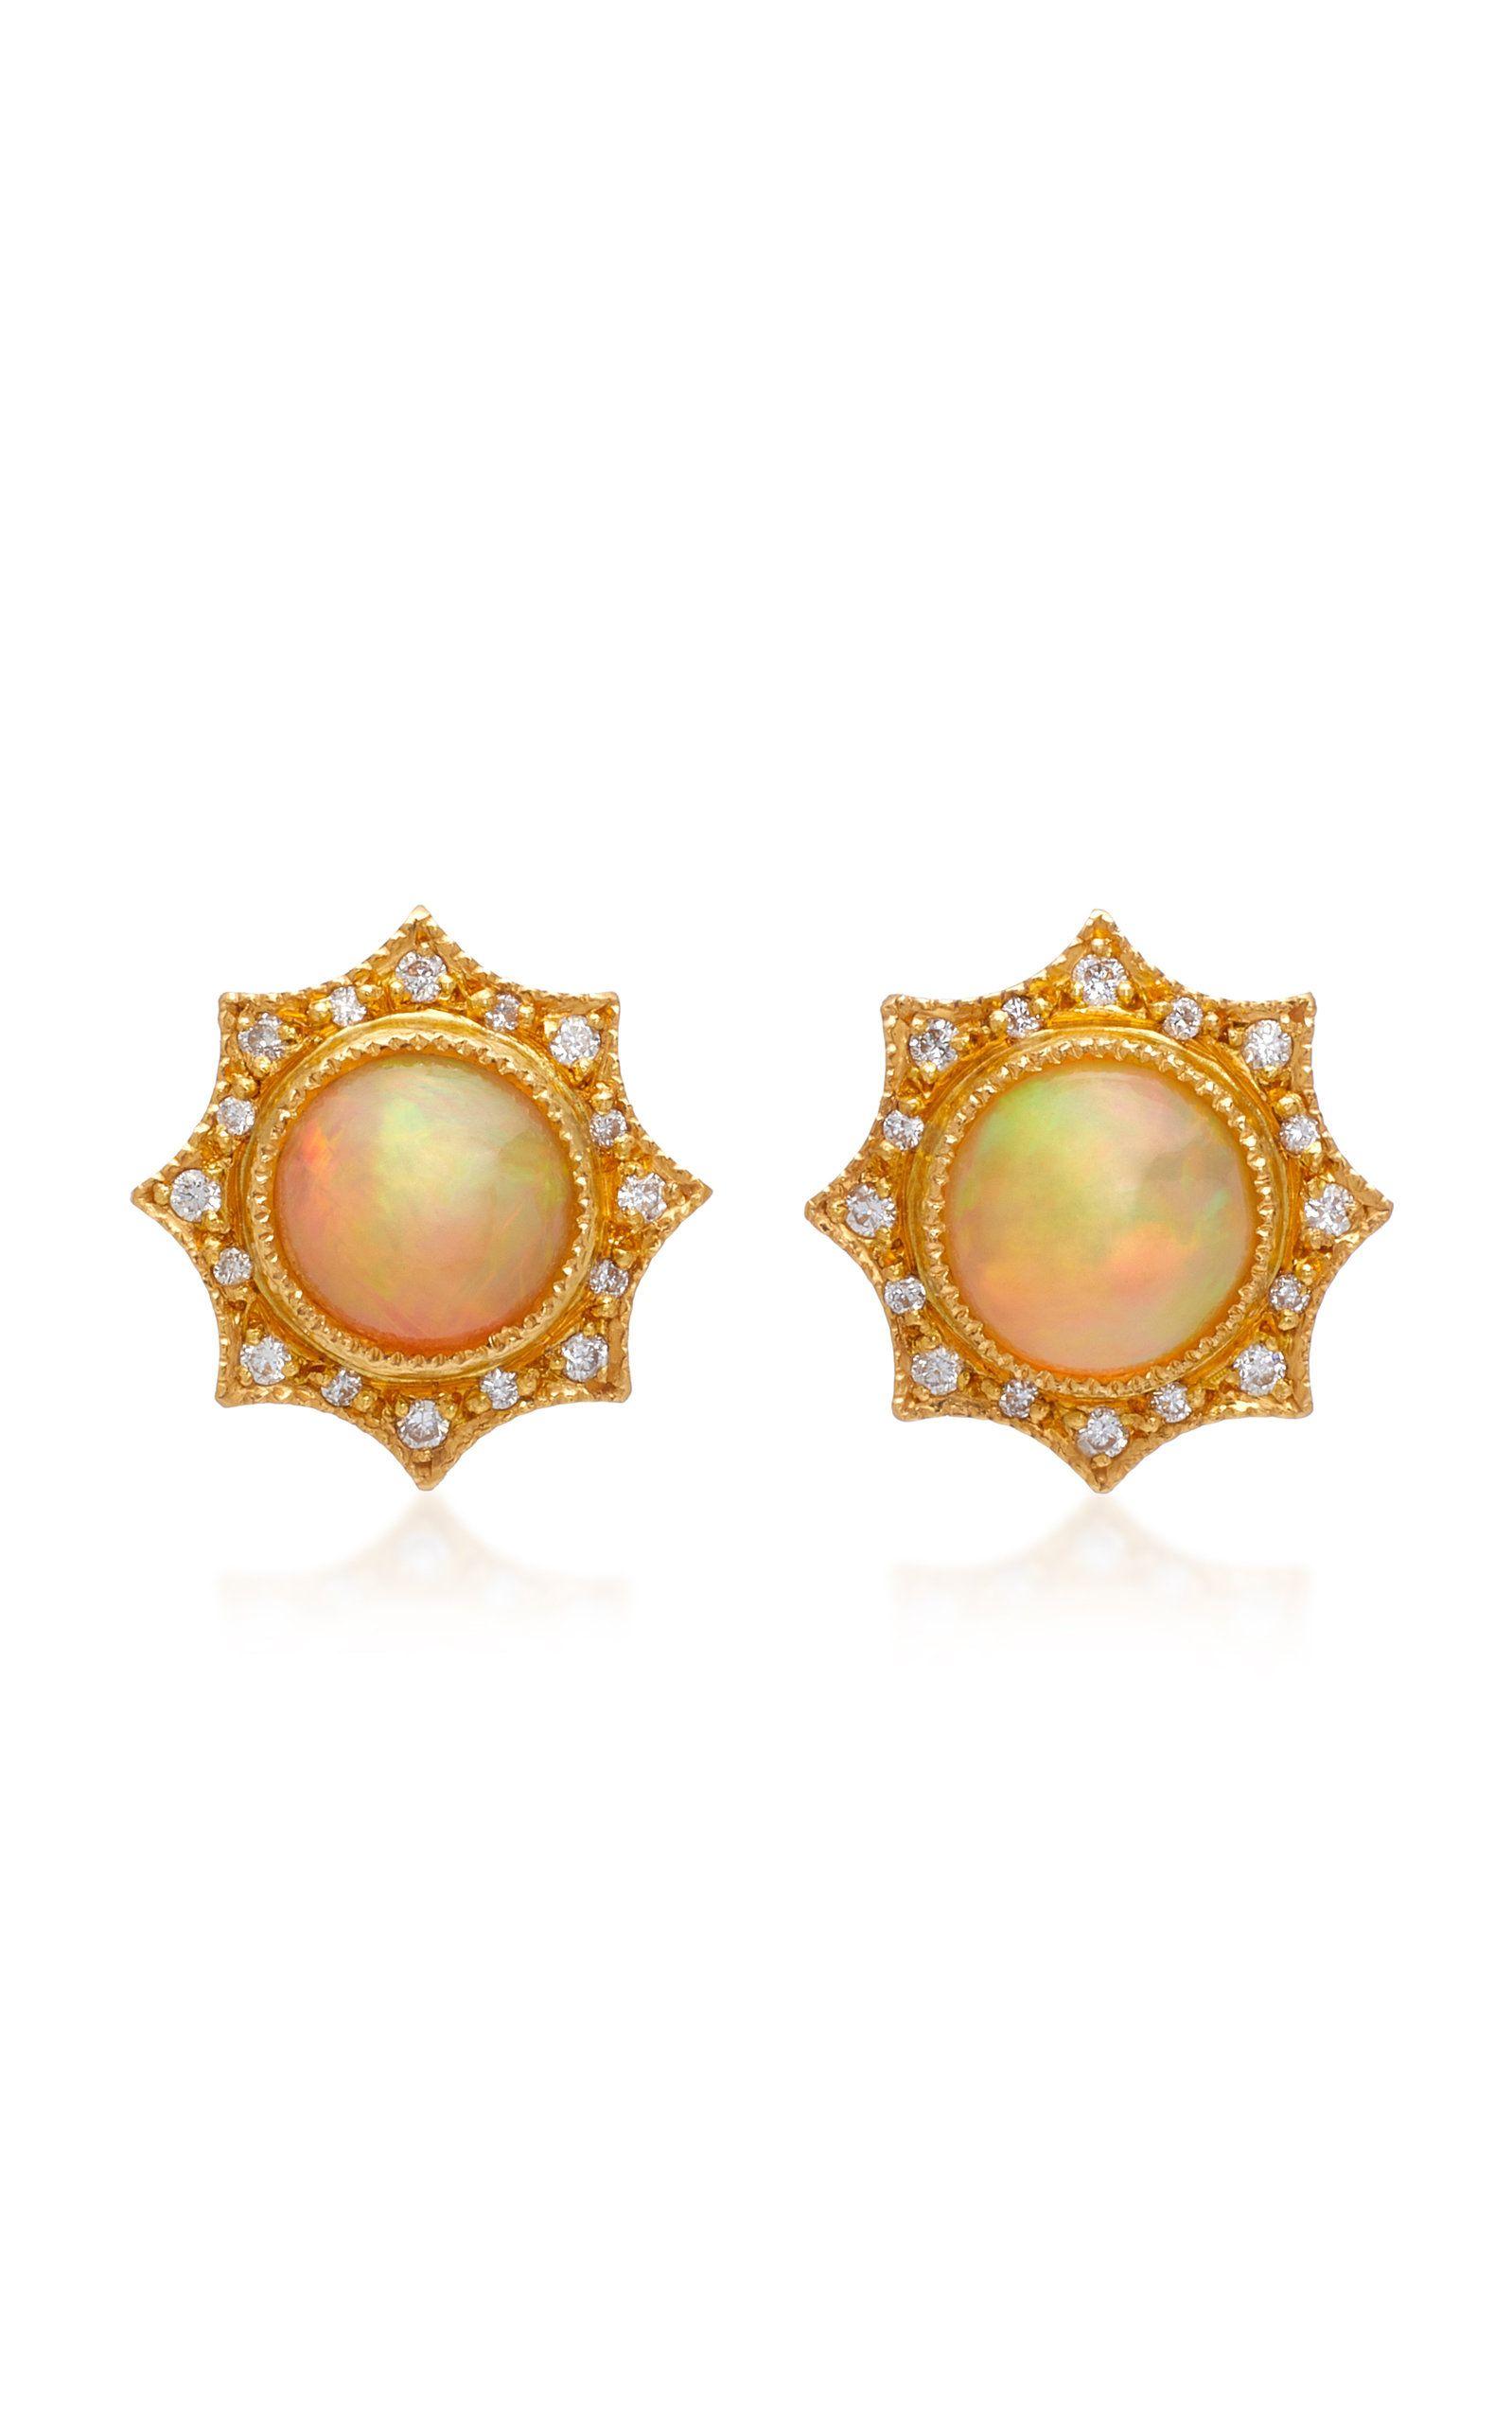 Arman Sarkisyan 22K Gold, Opal And Diamond Stud Earrings